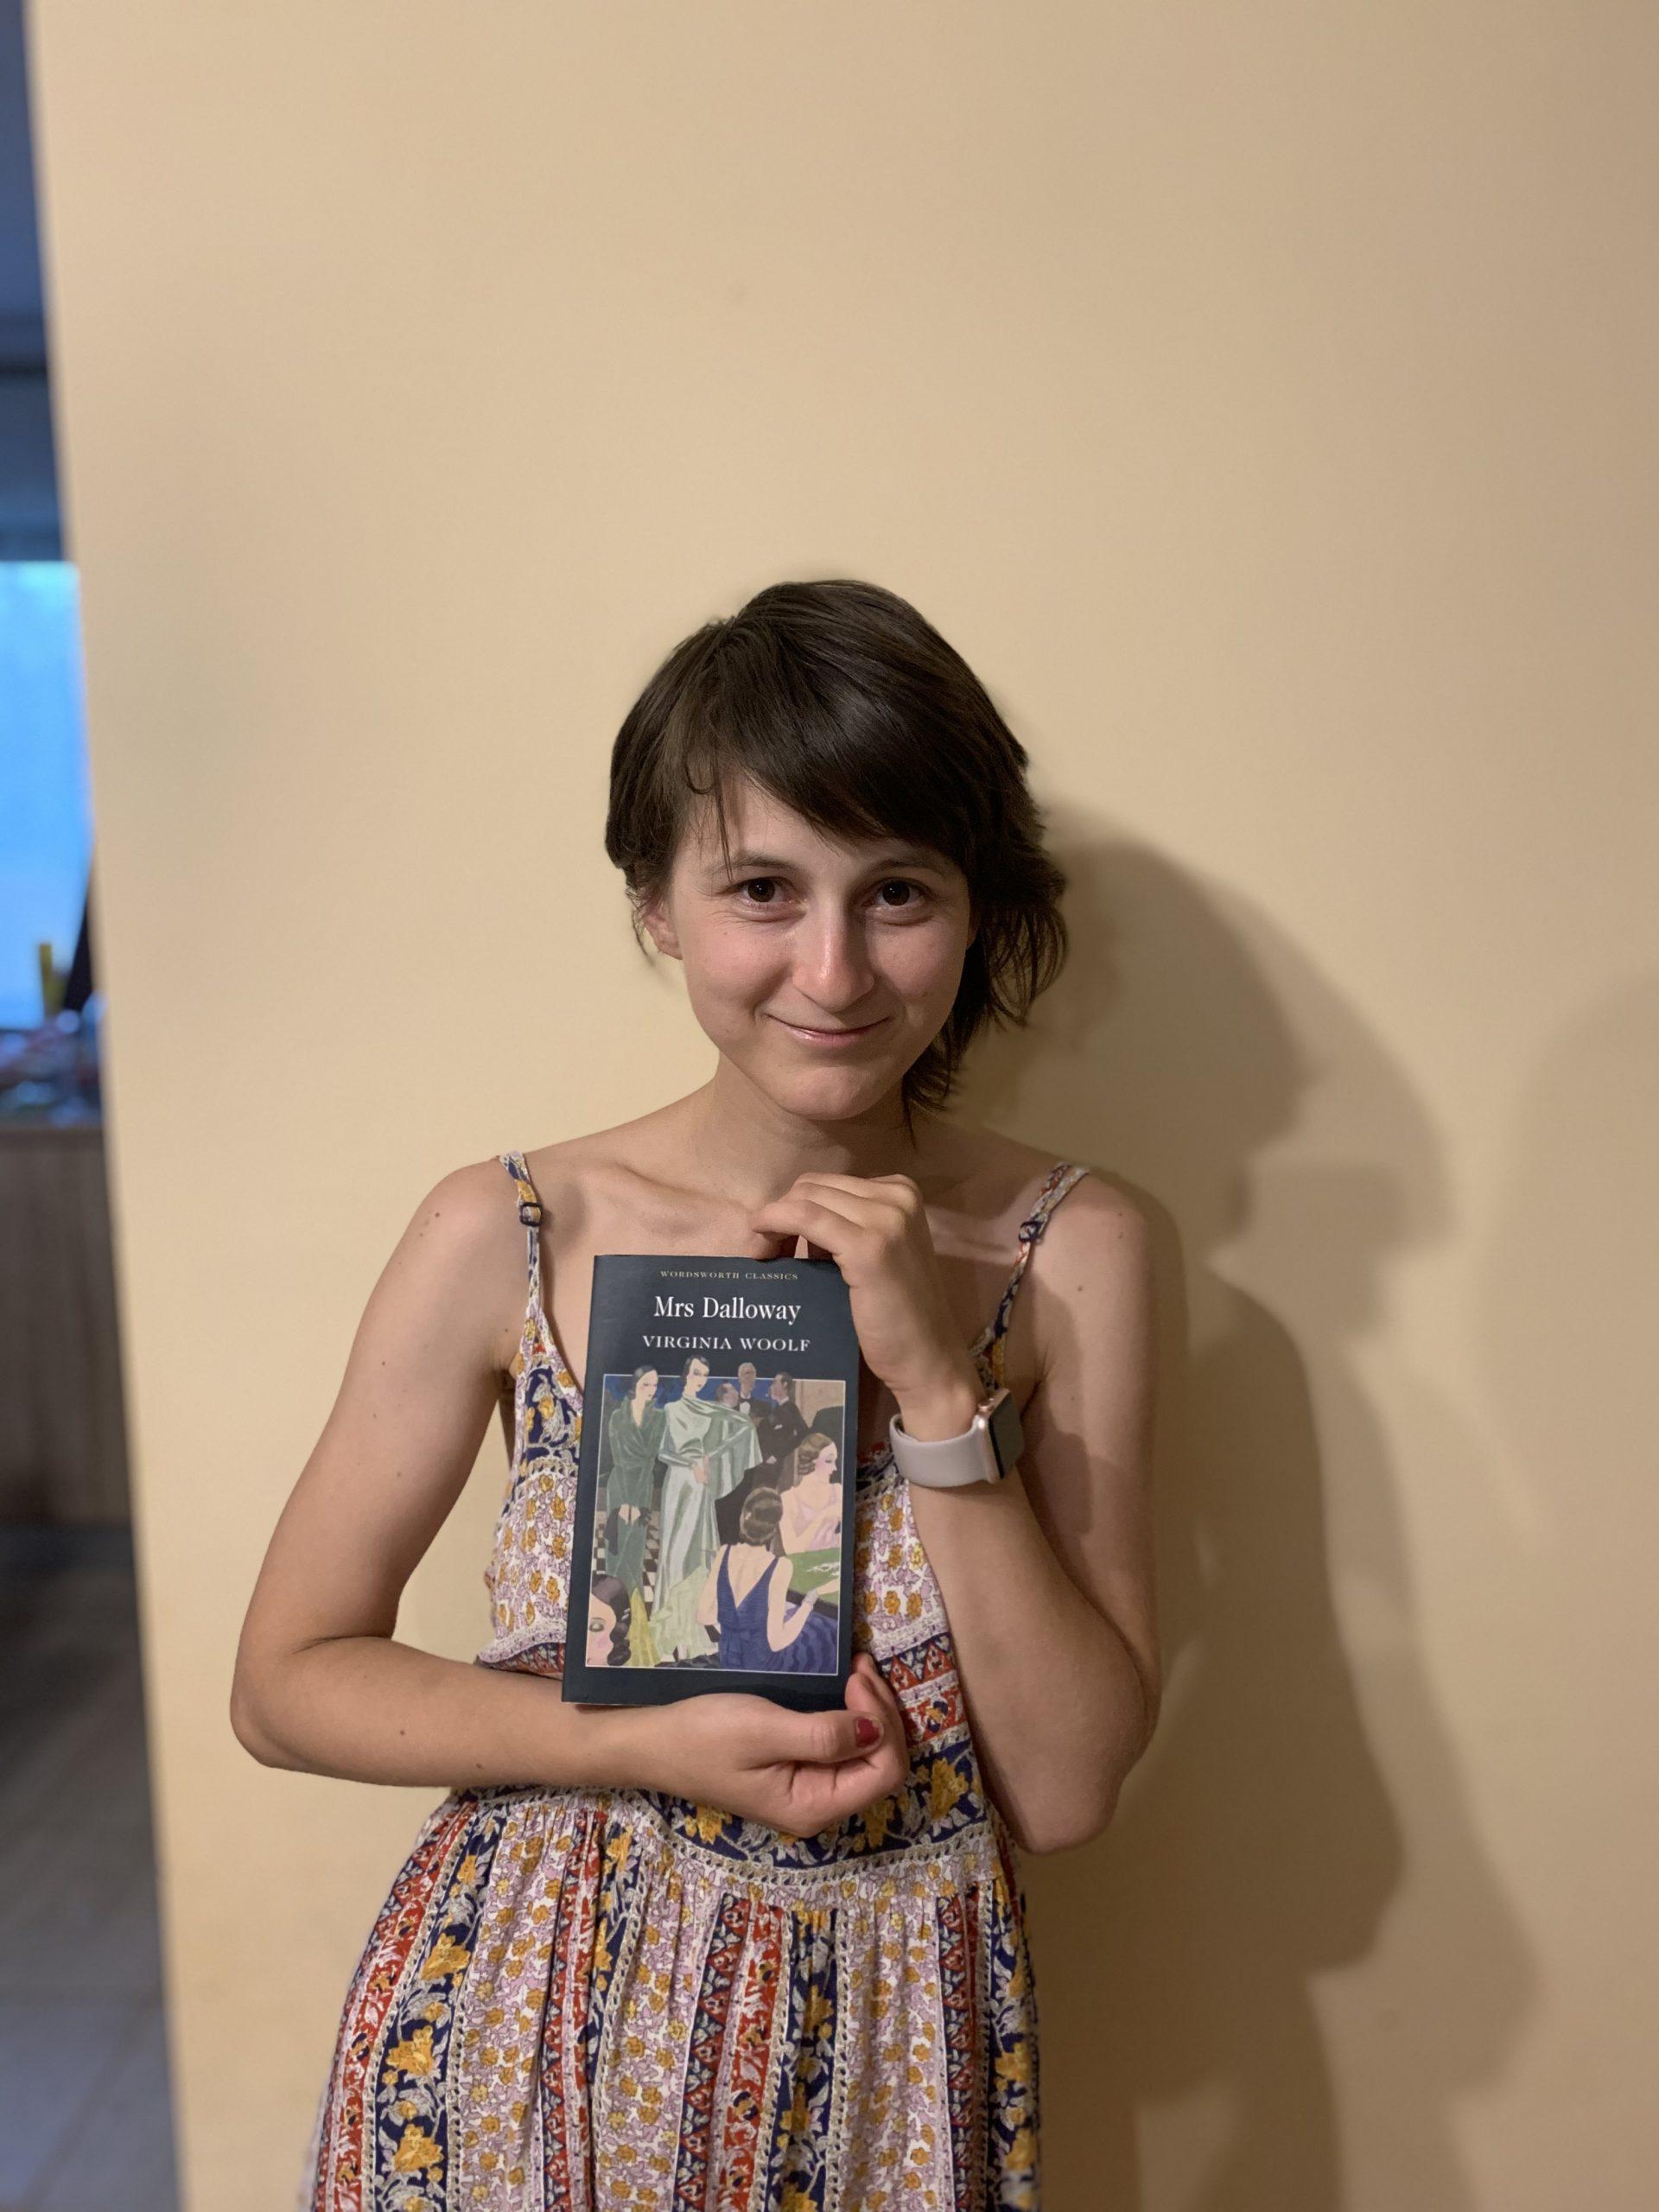 Vara când am citit Doamna Dalloway și m-am îndrăgostit de Virginia Woolf